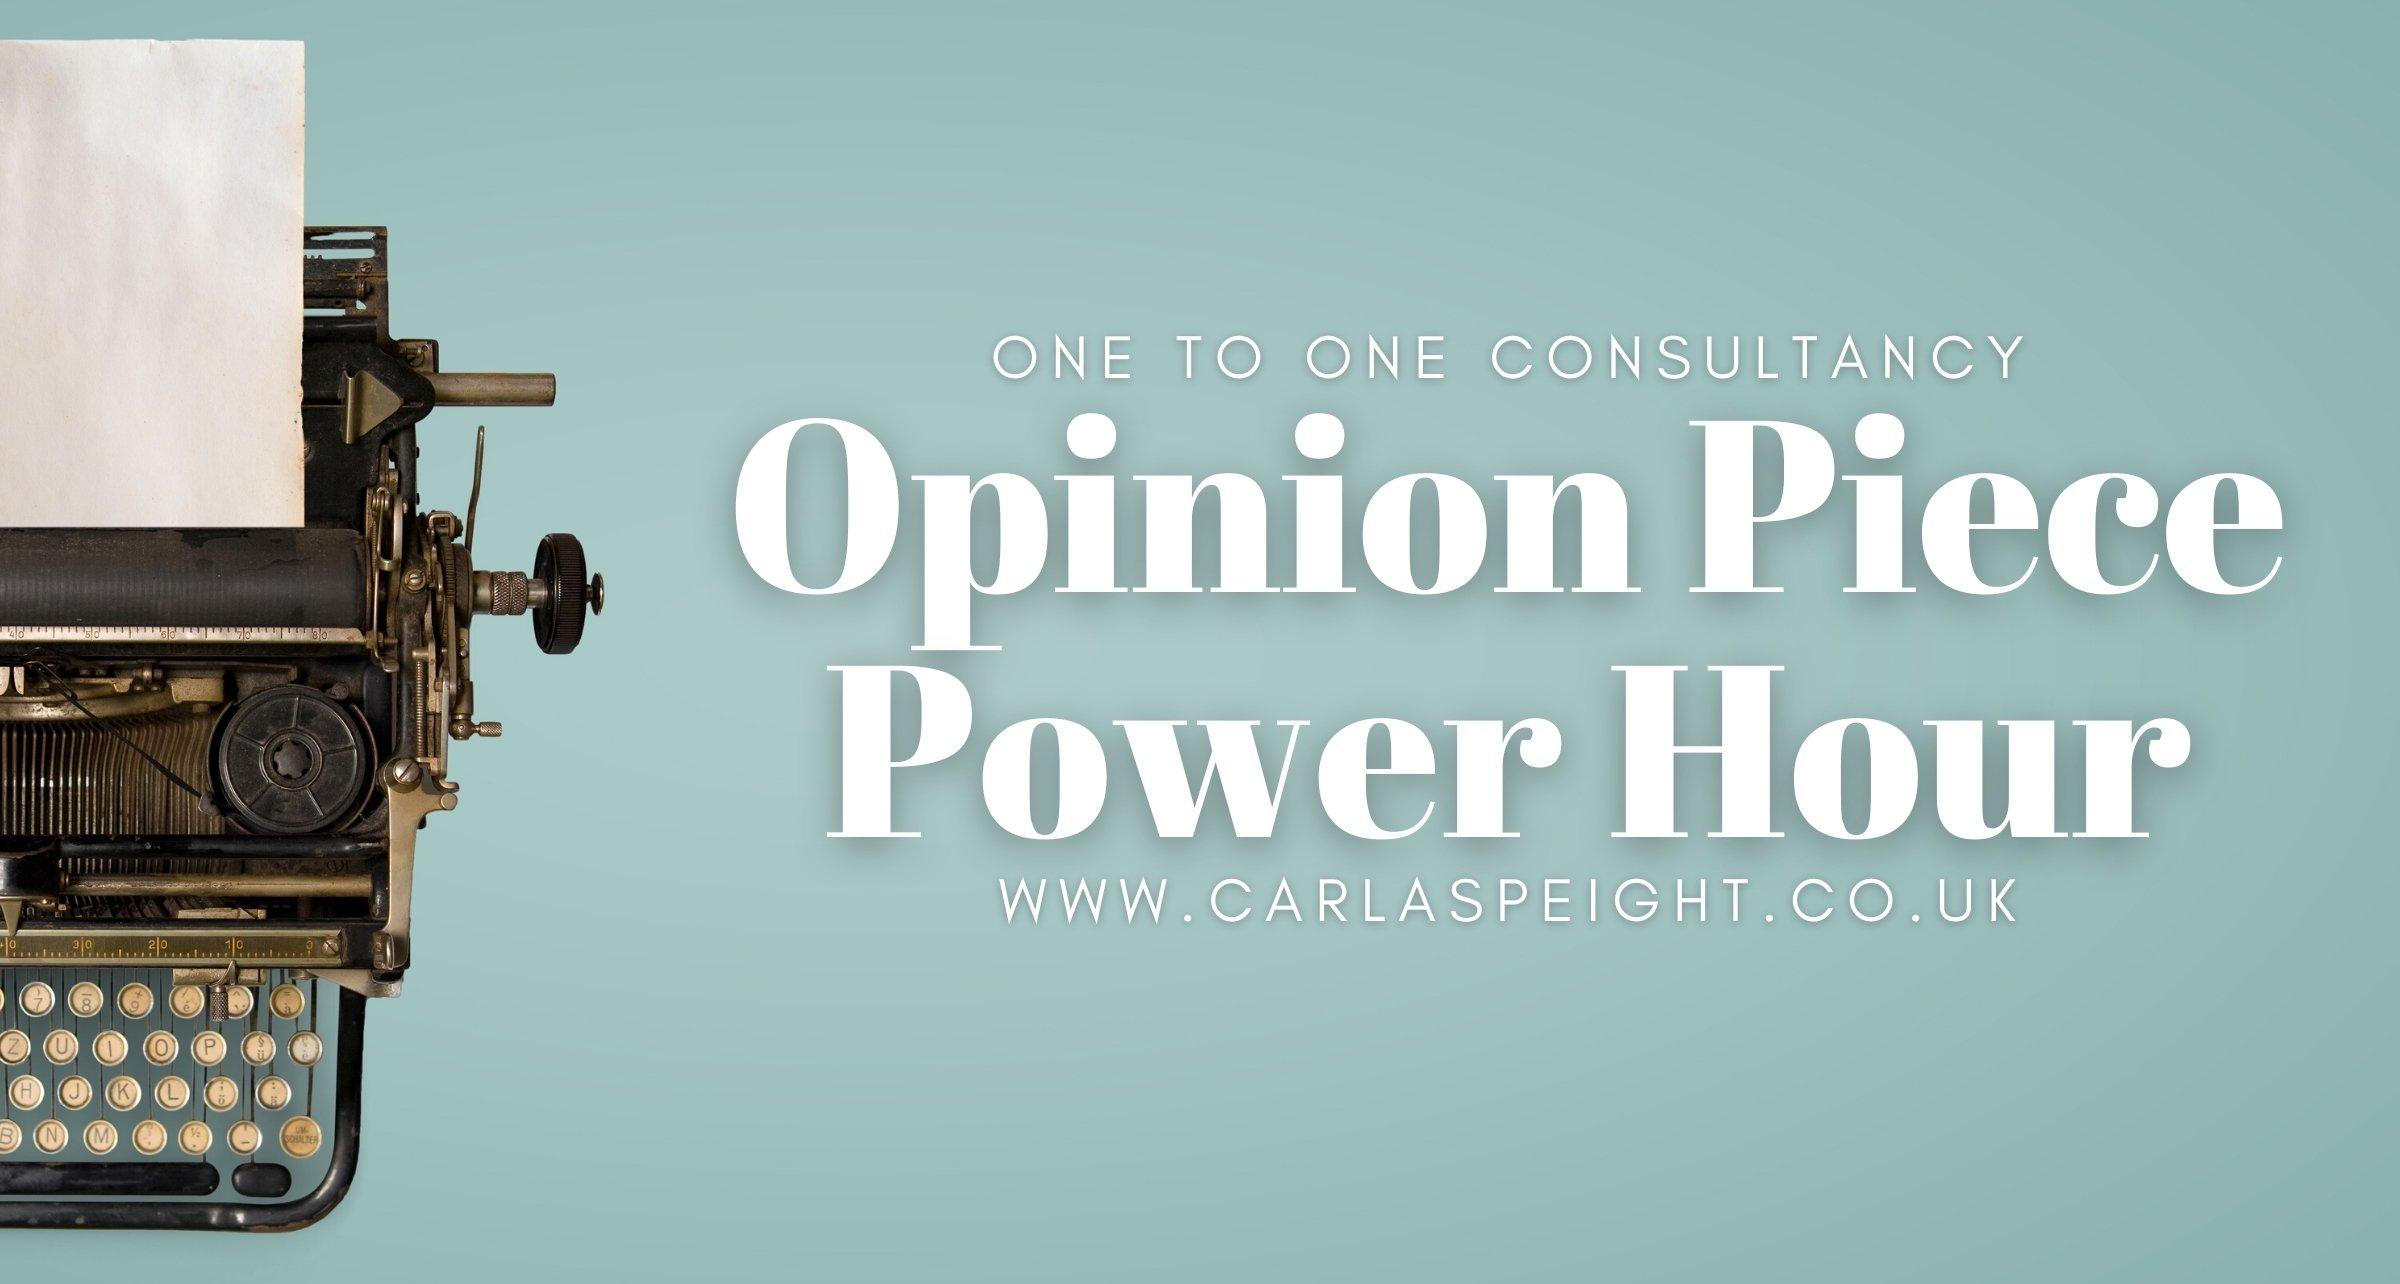 PR Power Hour, PR Consultant, PR and Marketing Consultancy,